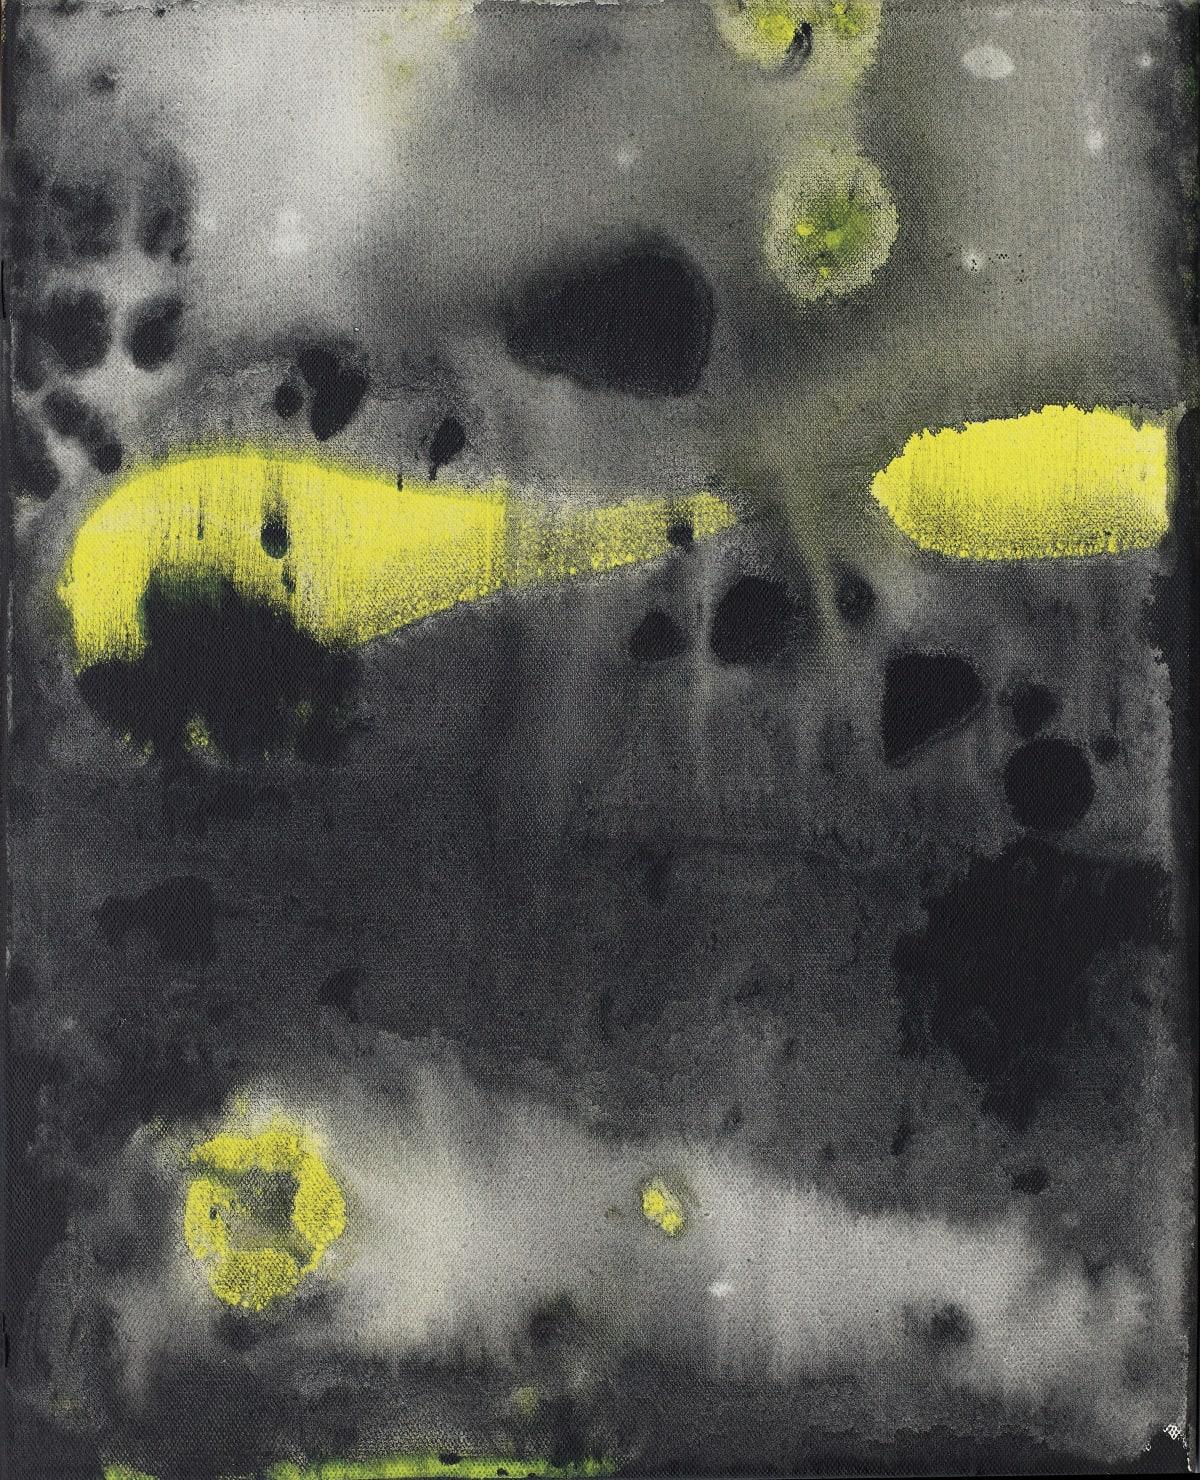 Li Lei 李磊, Between Clouds and Water Series 5-02, 2012